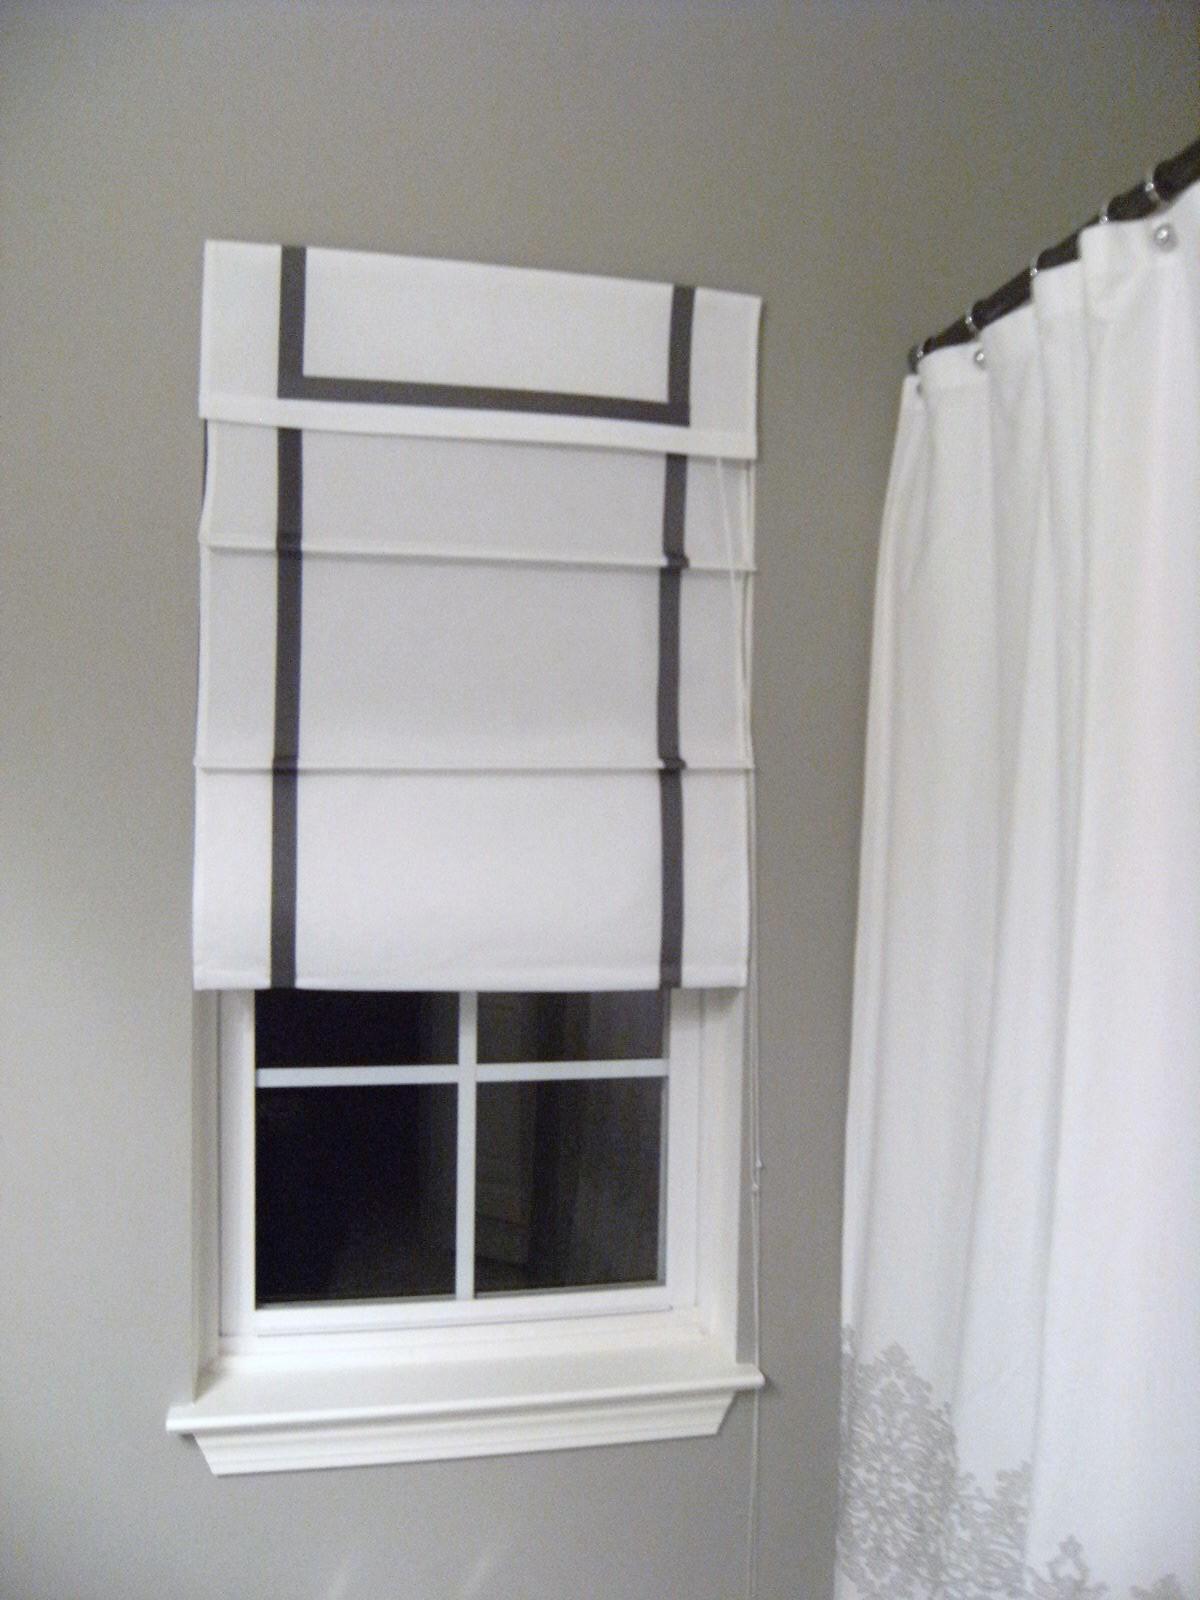 southgate residential diy ribbon edged roman shades. Black Bedroom Furniture Sets. Home Design Ideas